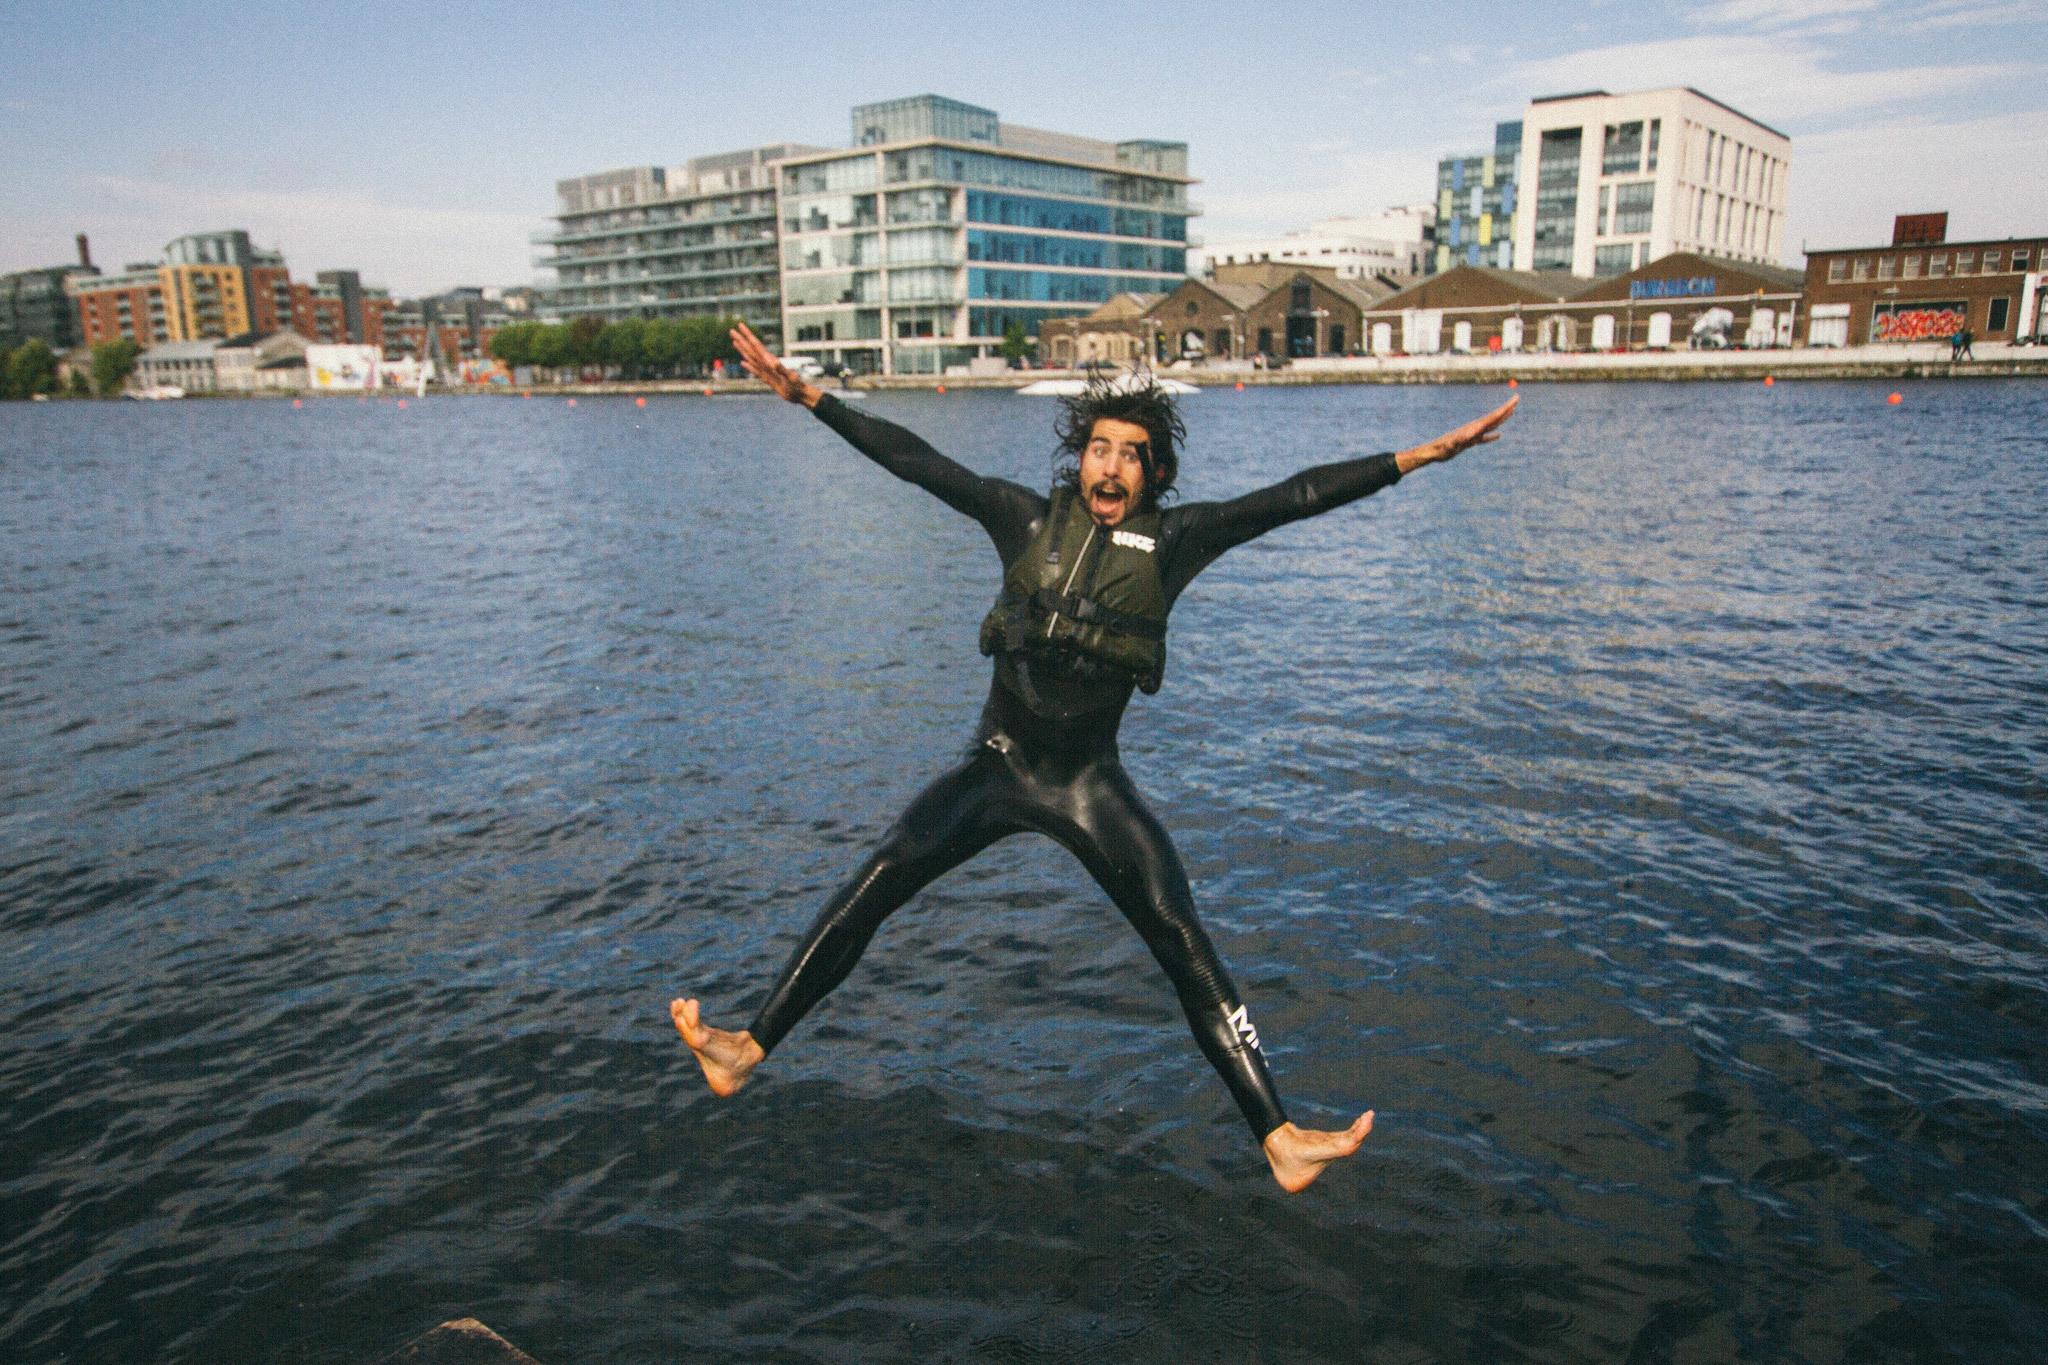 Dublin for adrenaline junkies